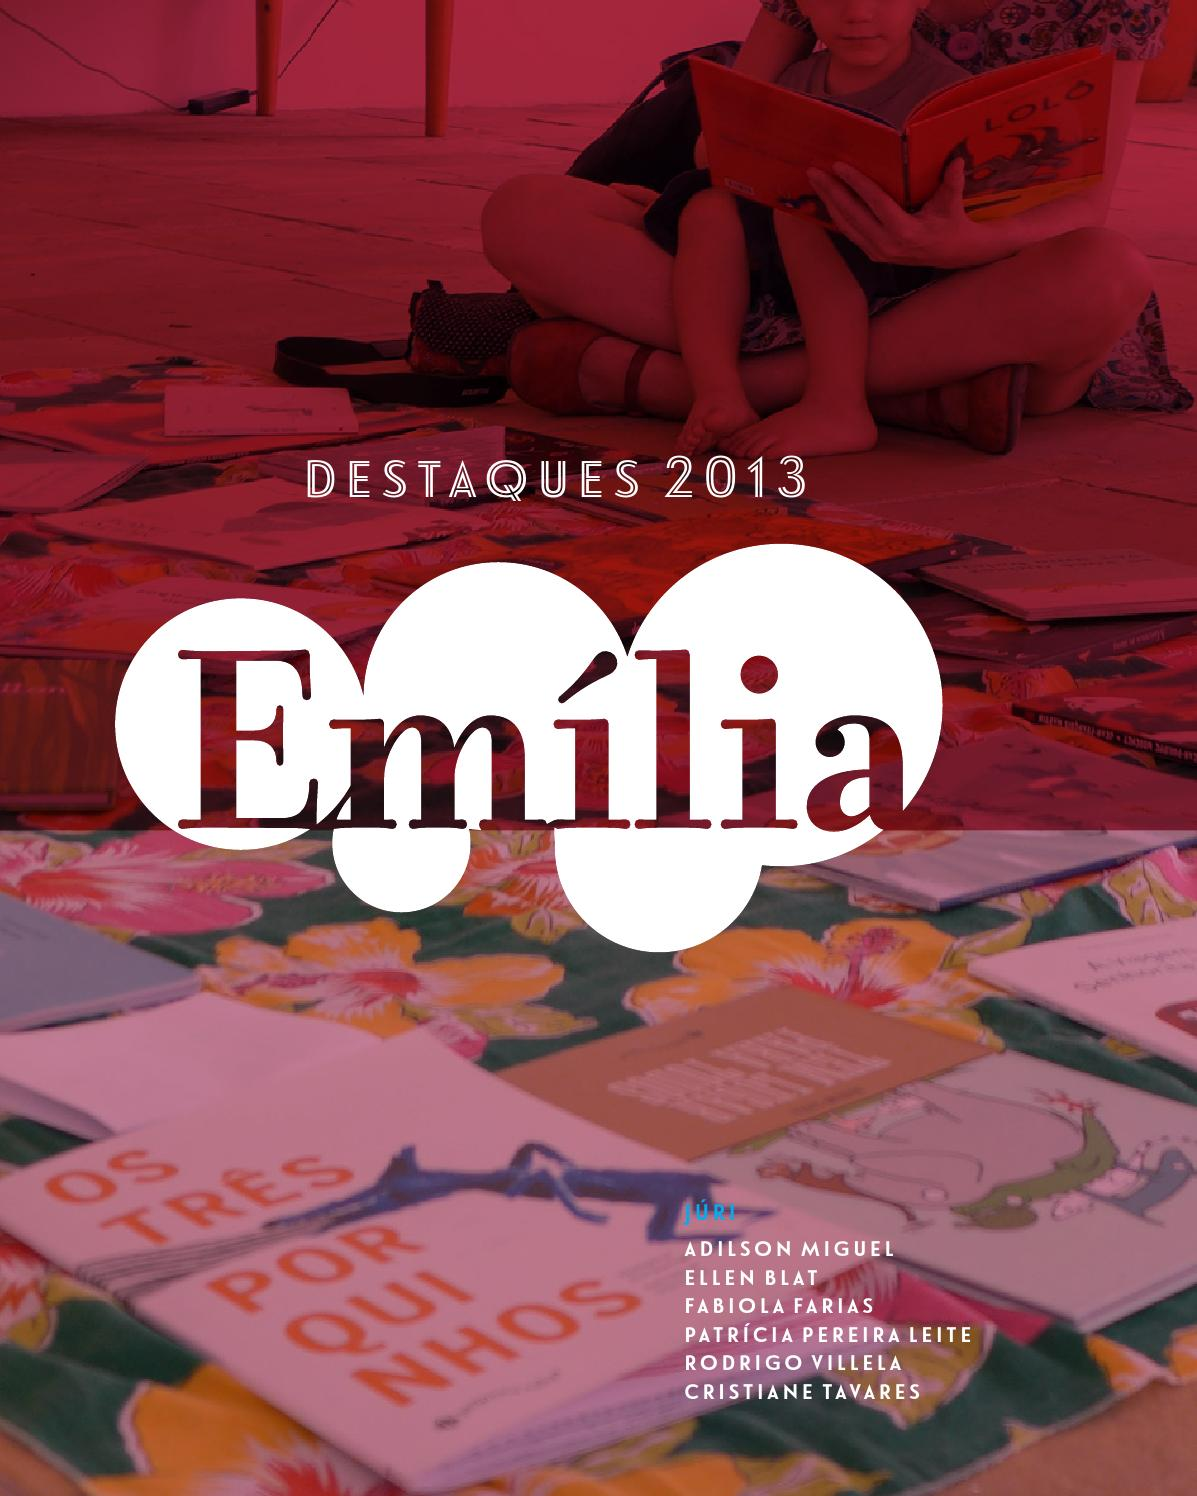 Destaques Emília 2013 by Dolores Prades - Issuu